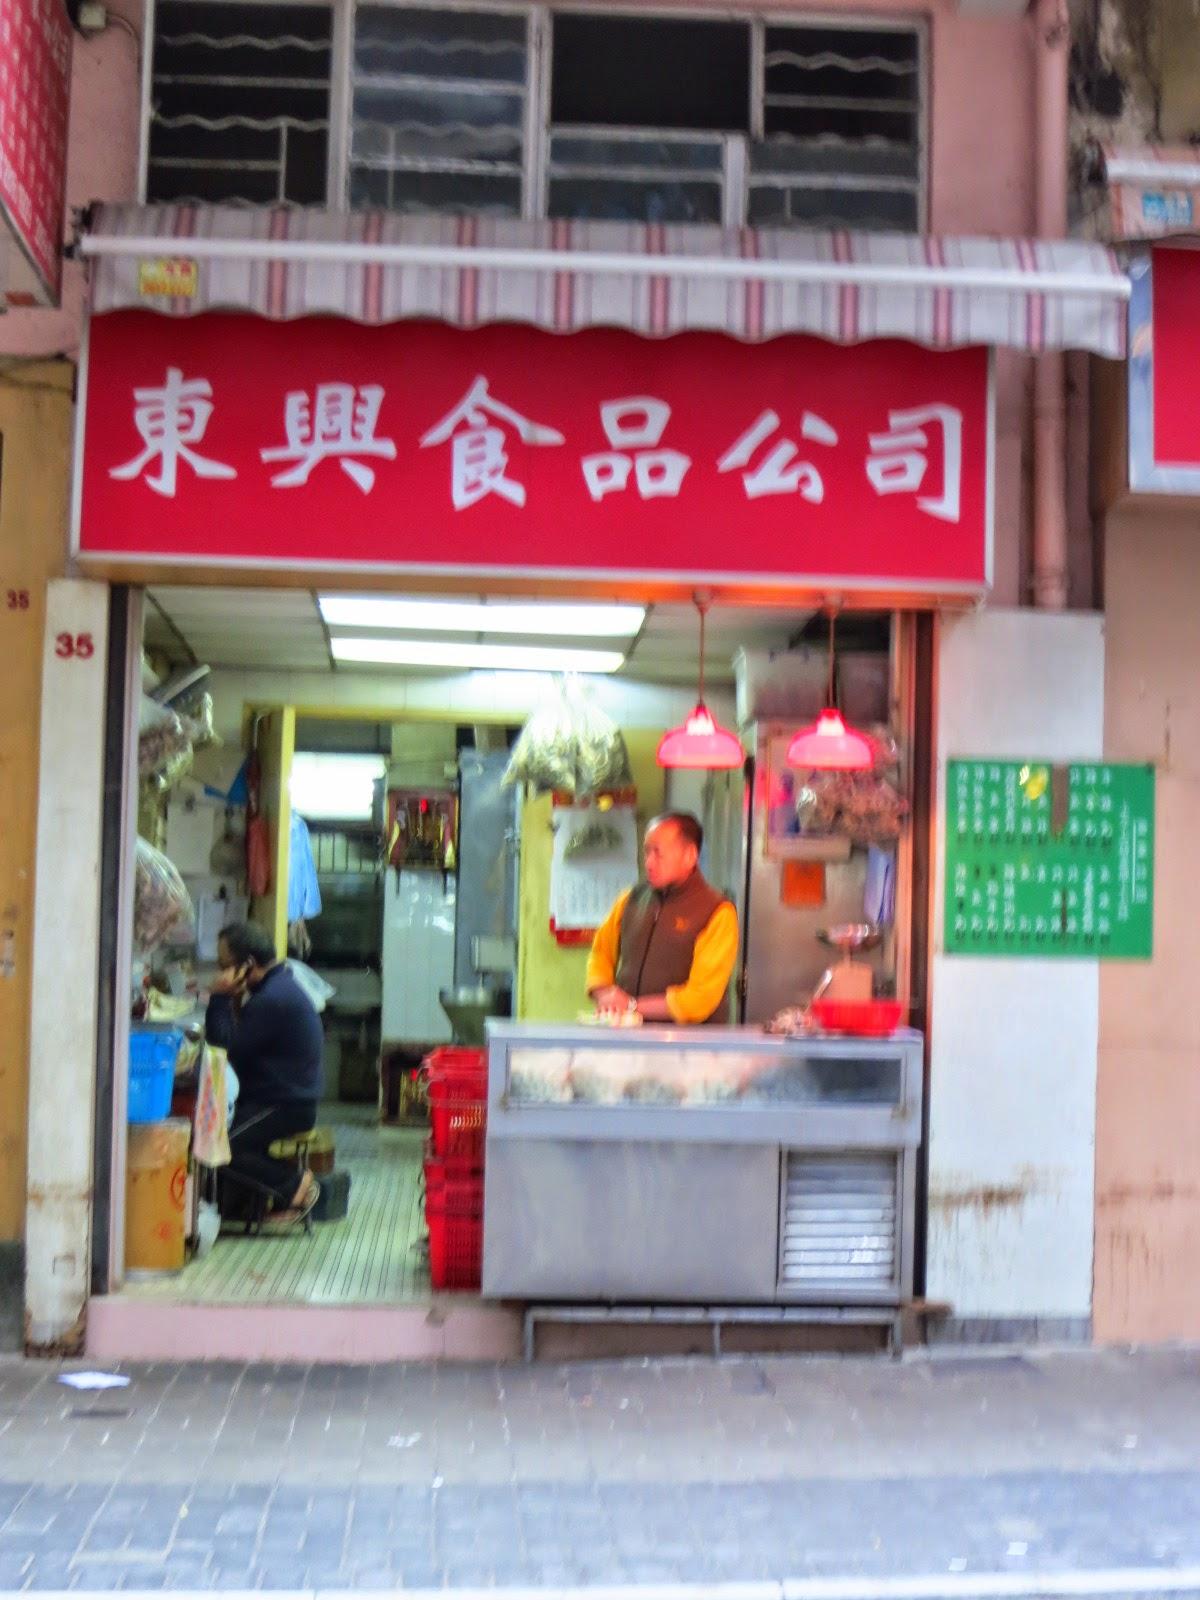 jj......life of an ordinary: 東興食品公司@西環 - 出名丸餃